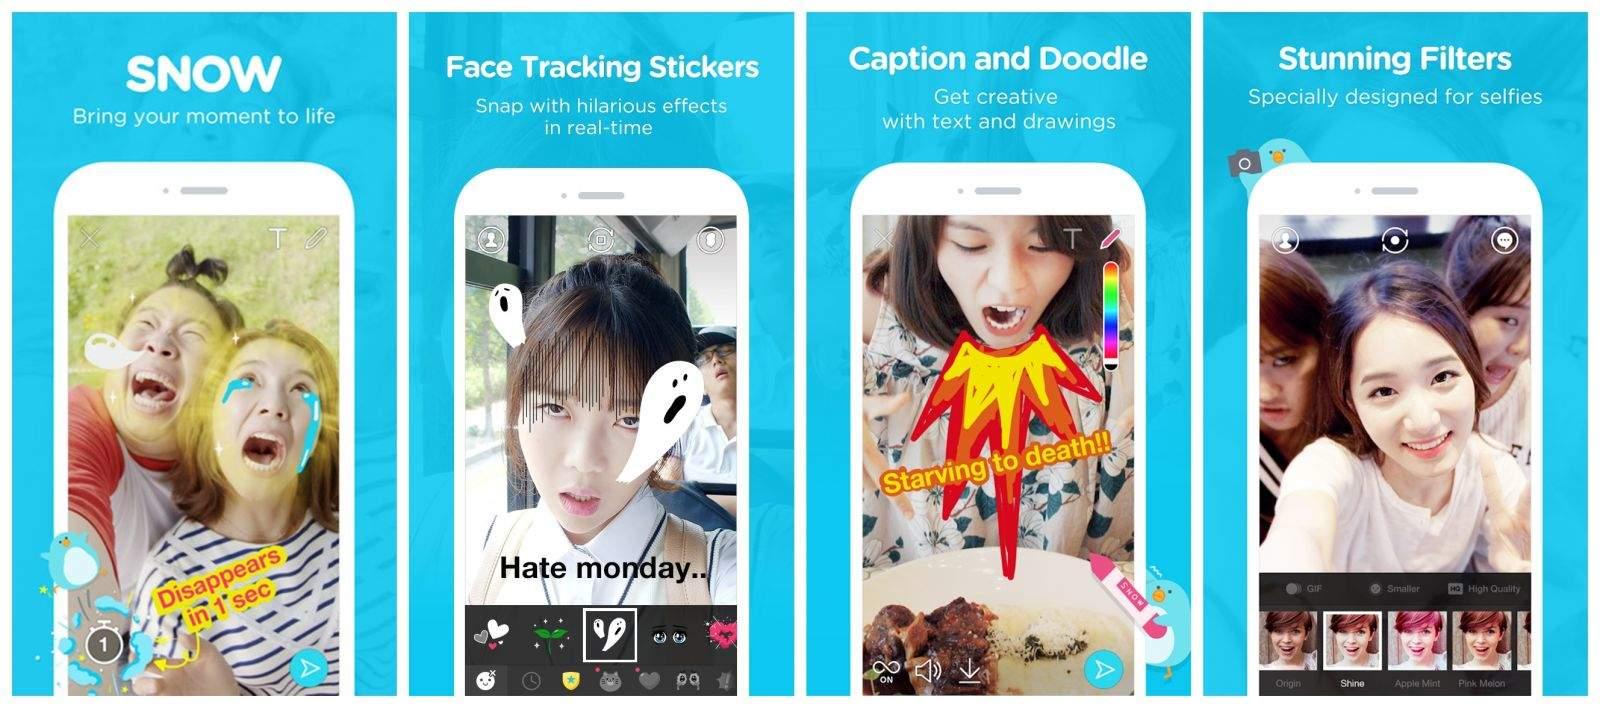 snow-app-snapchat-konkurrent